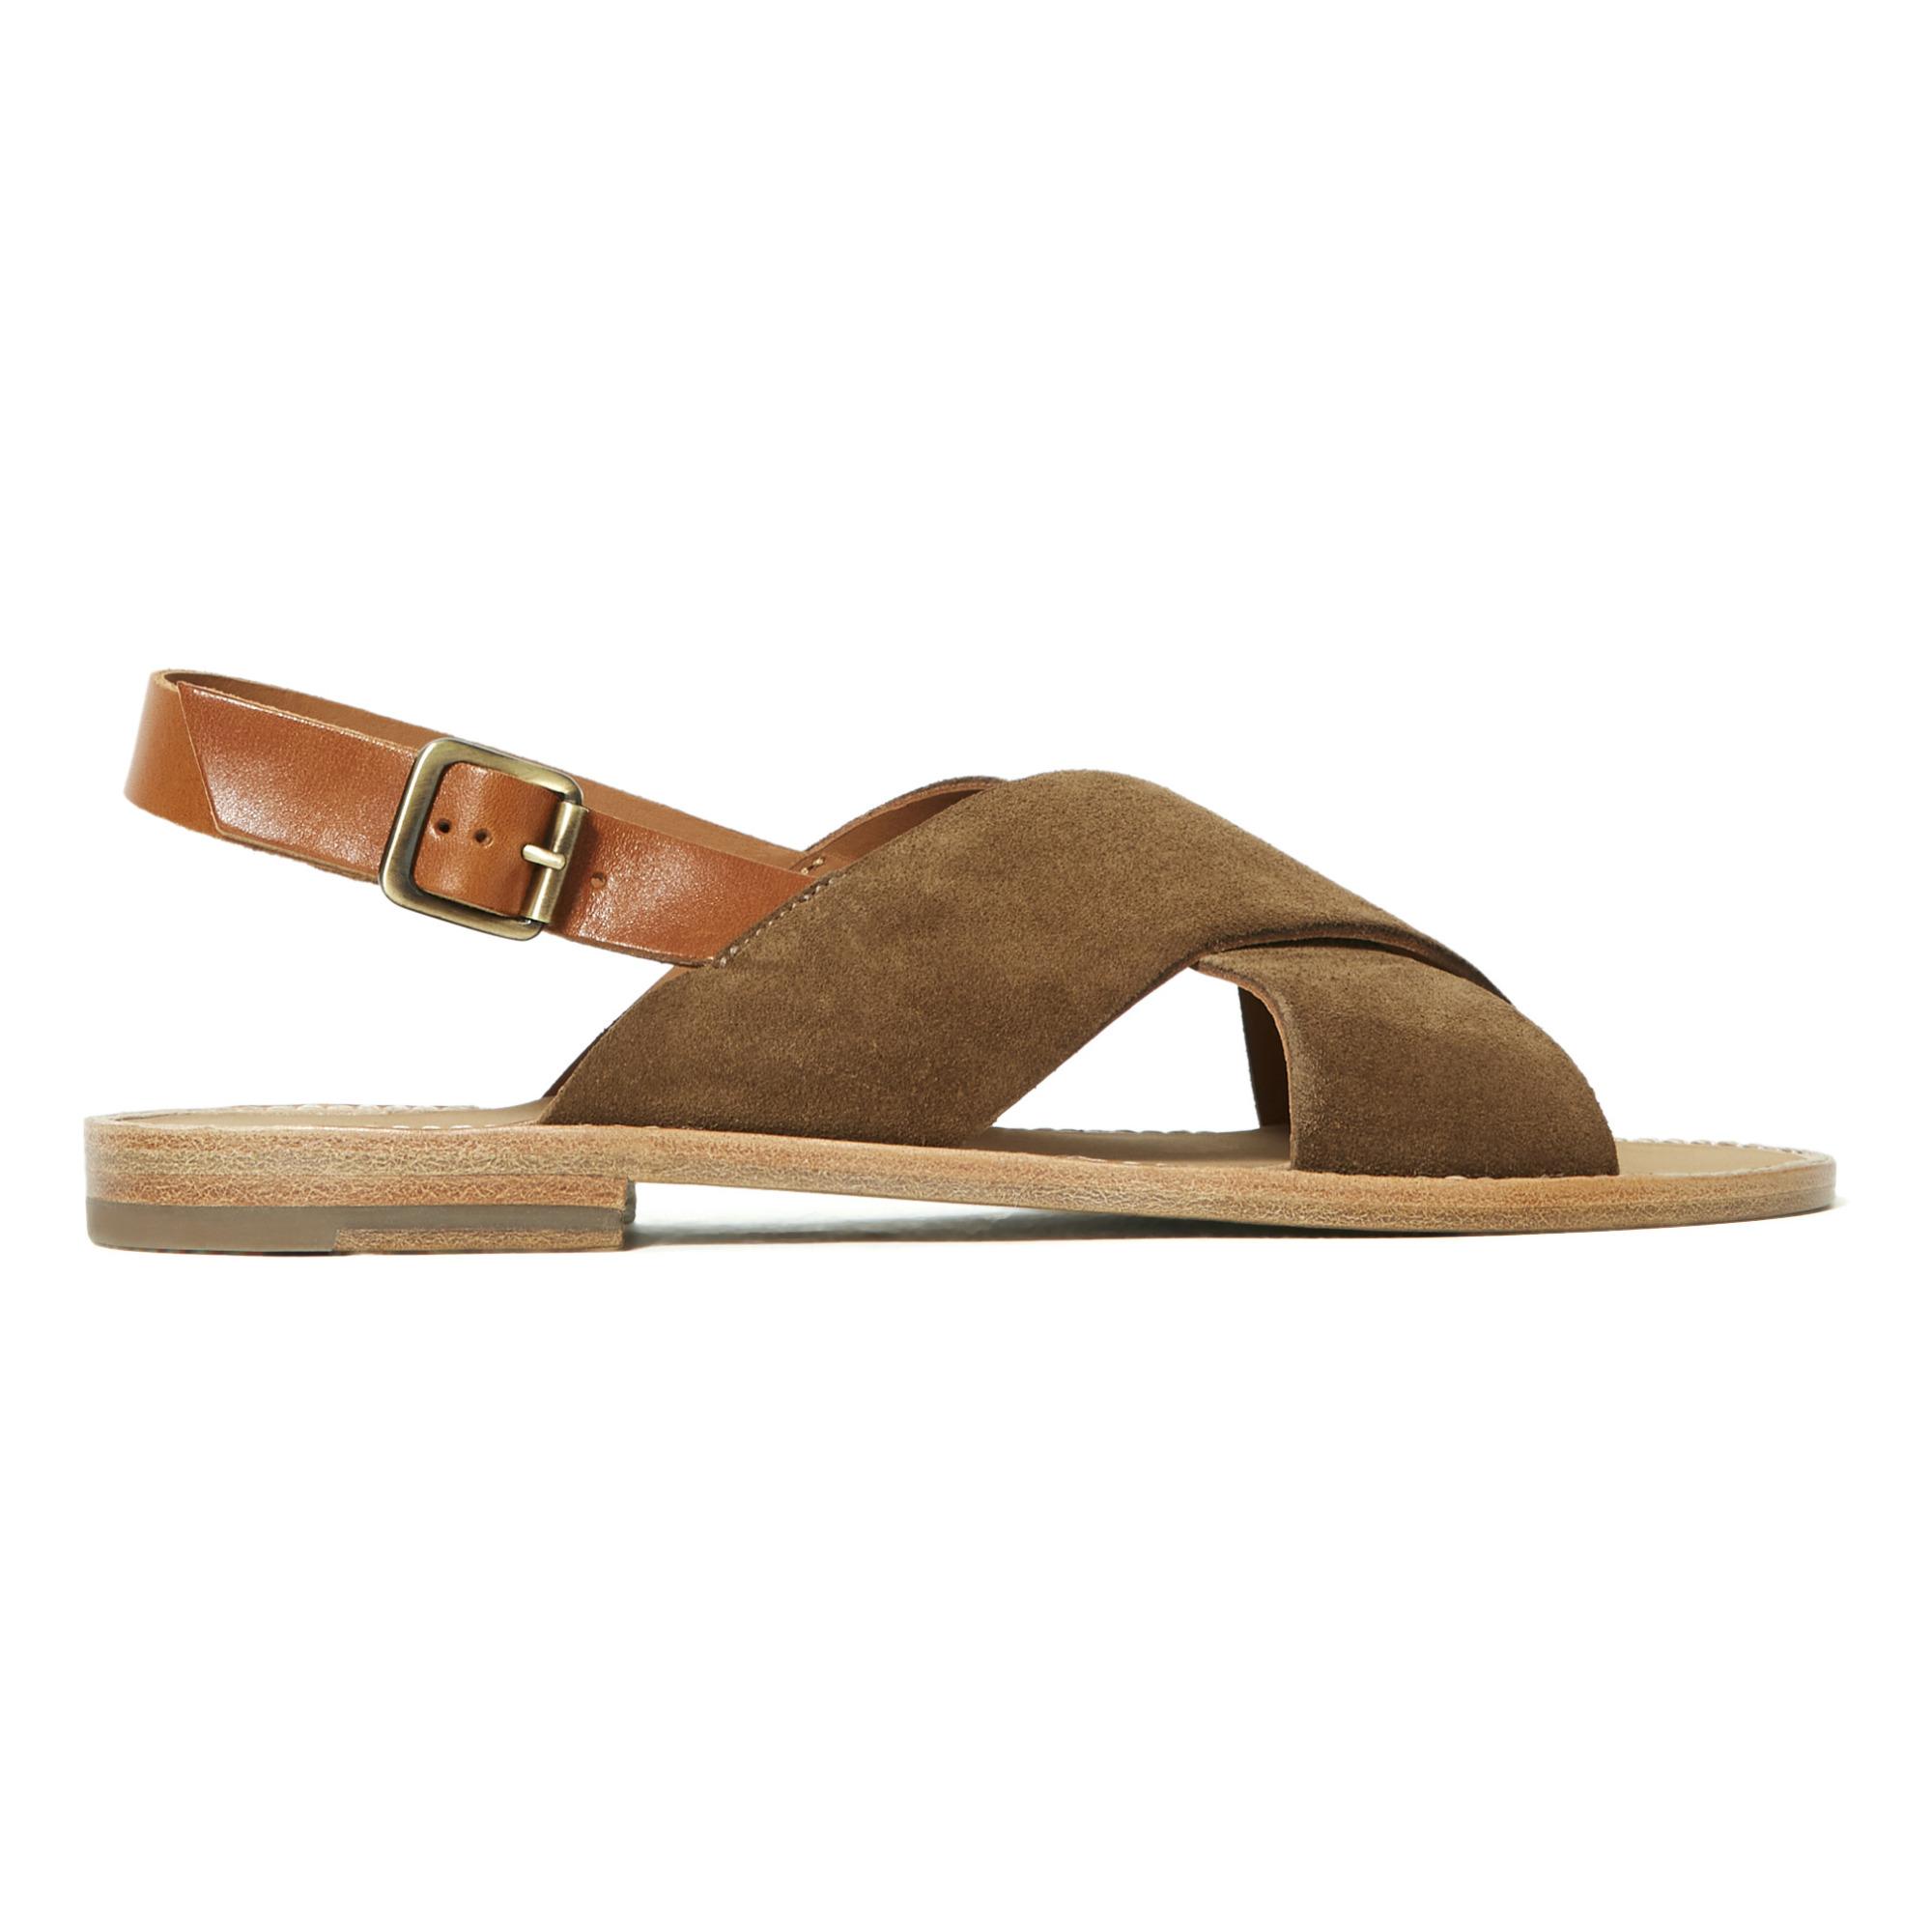 Sandales Birmanie Bi-matière